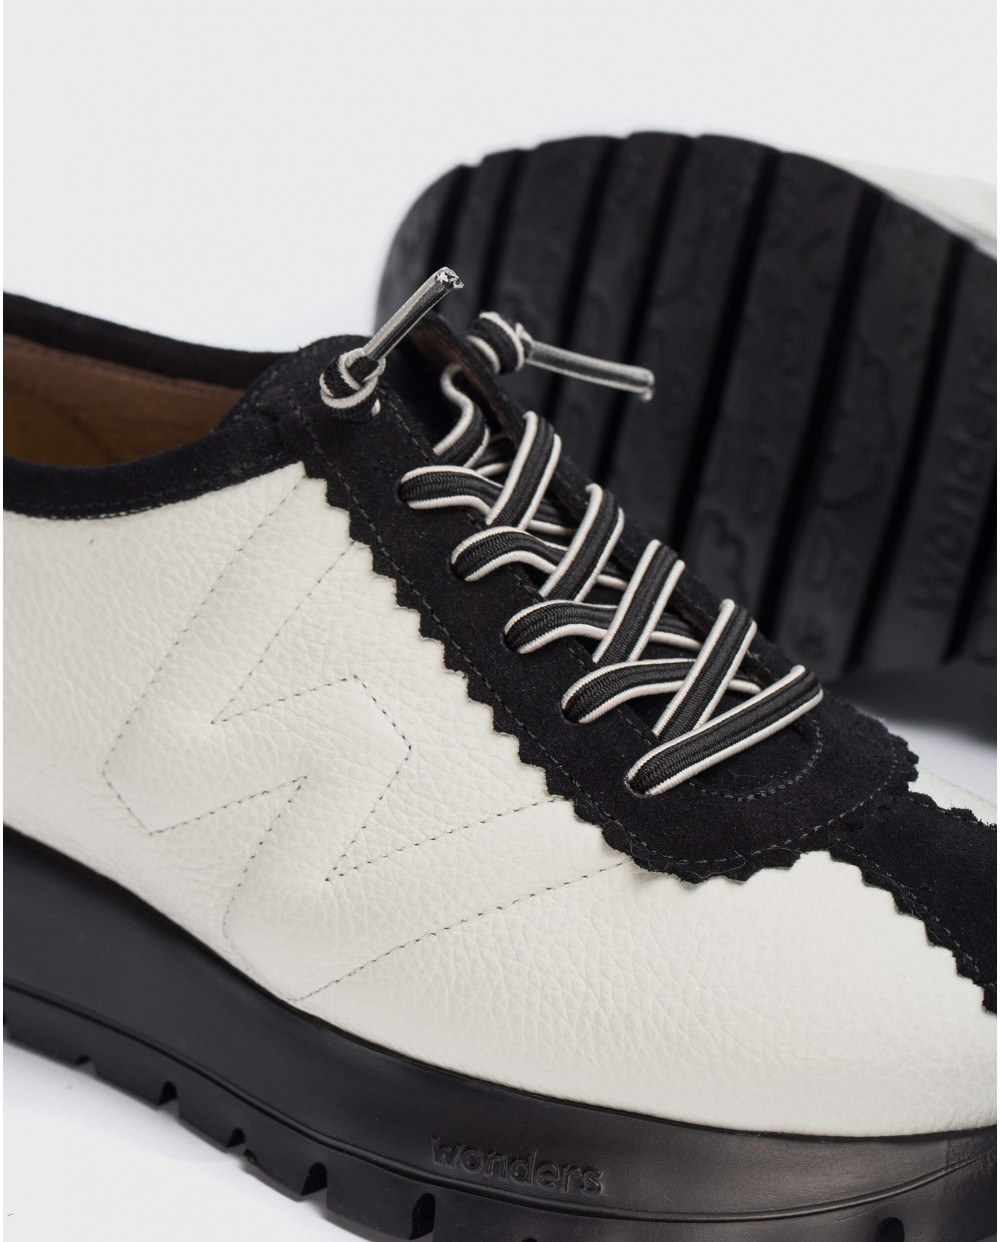 Wonders-Flat Shoes-Two-tone B-Star Sneaker